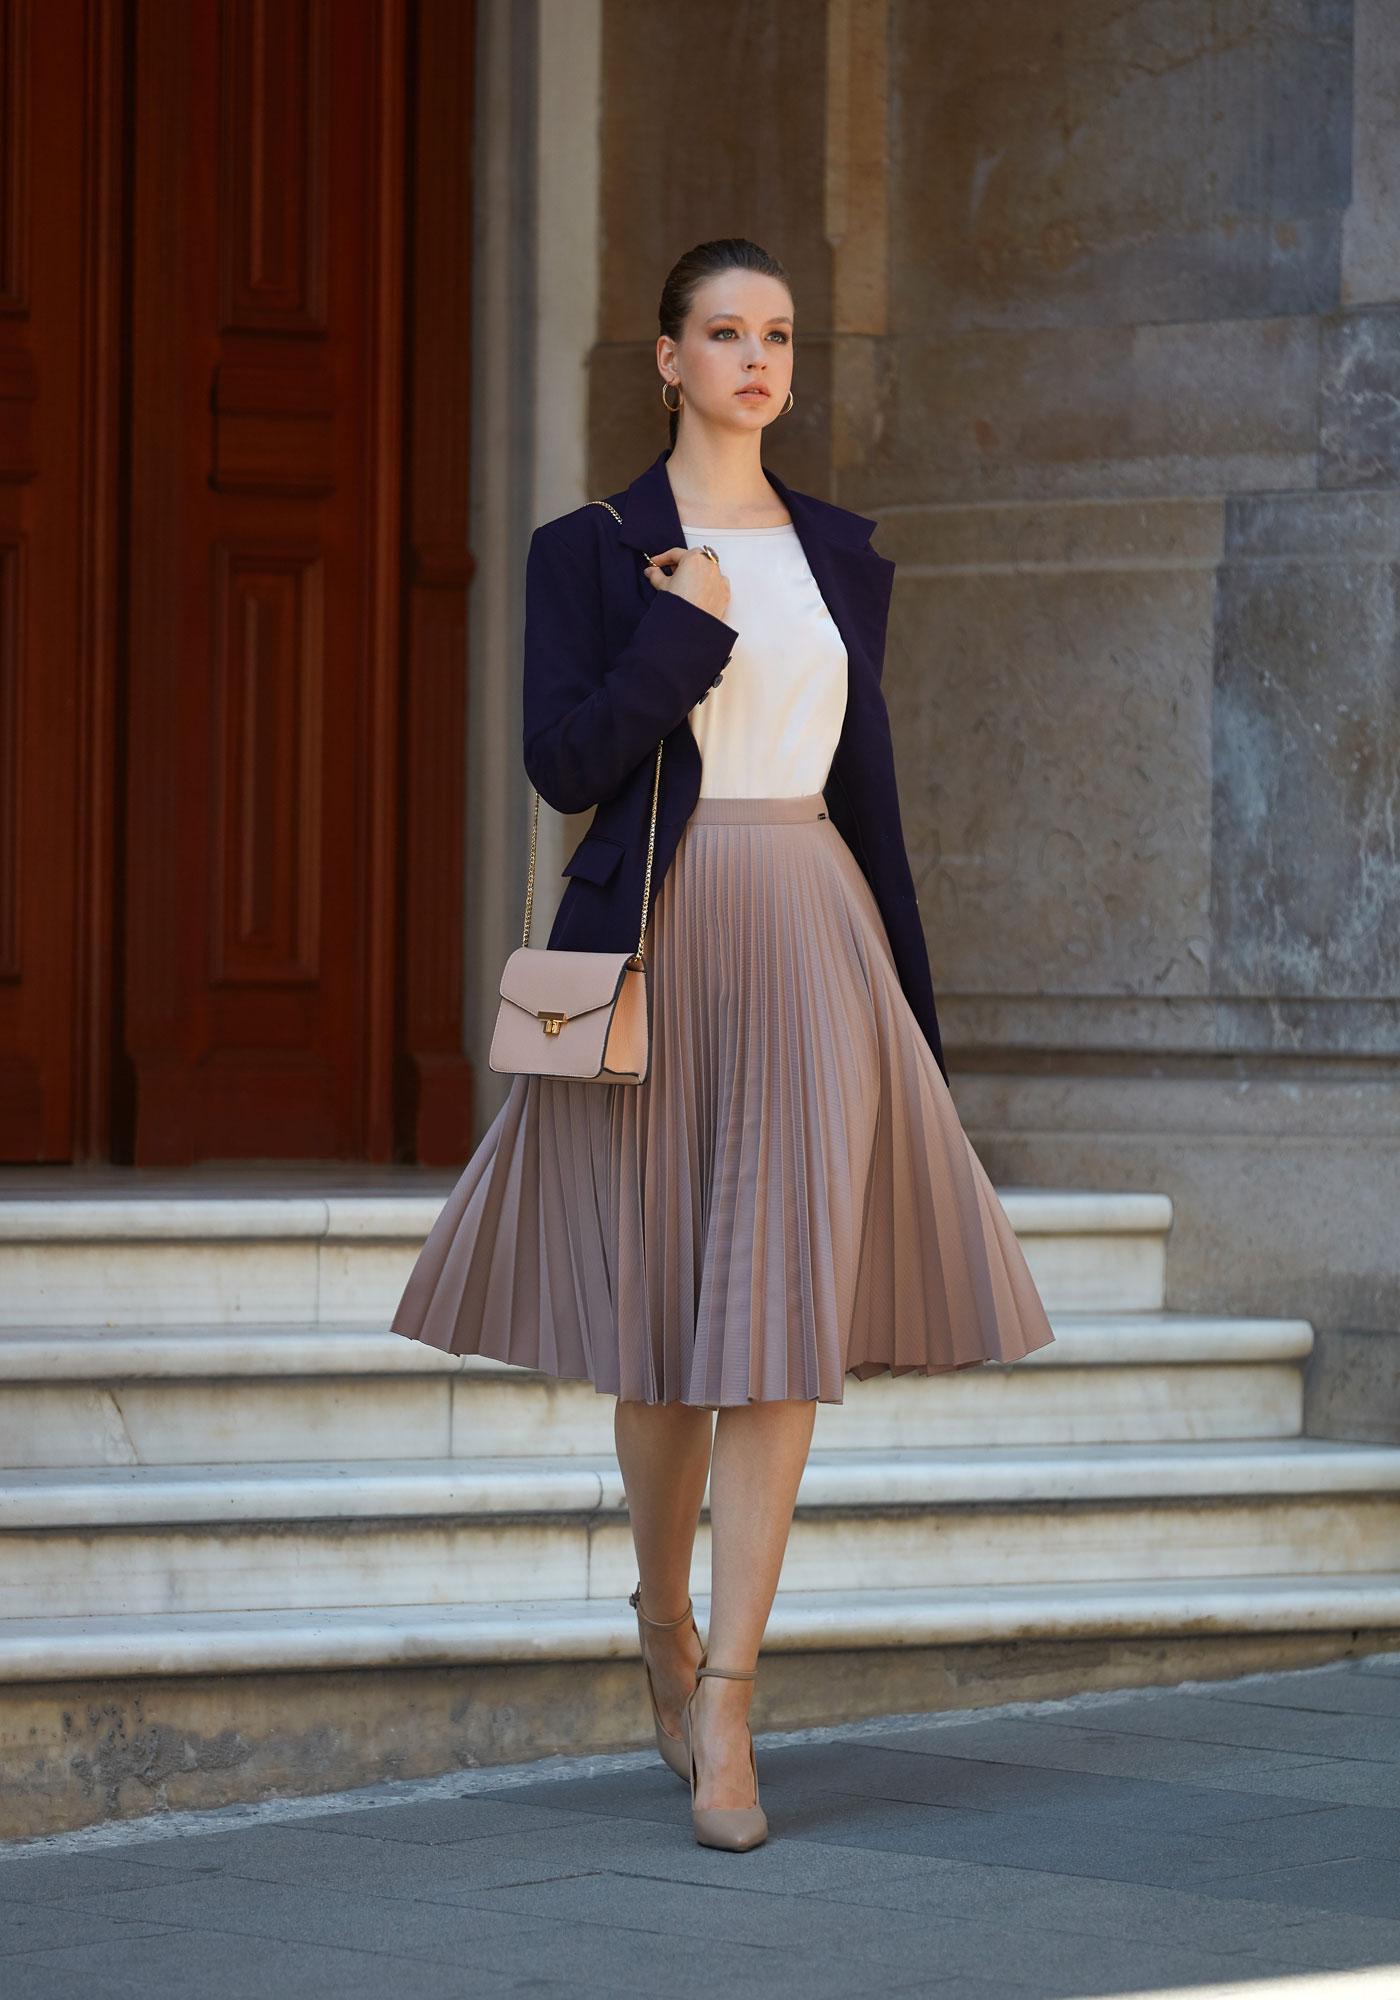 Little pleated skirt